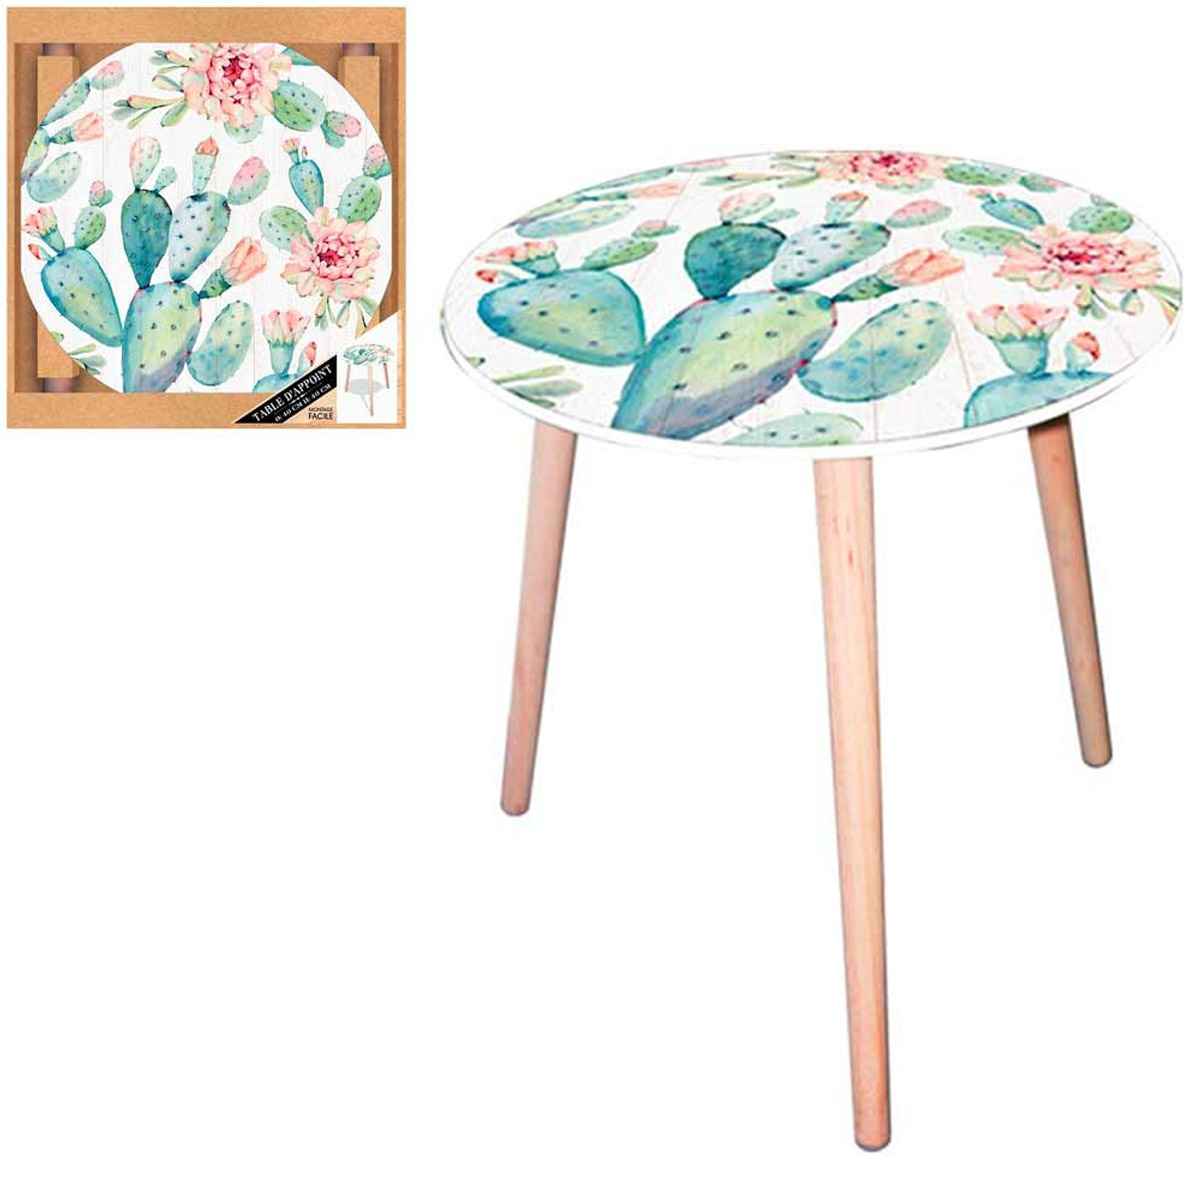 Table ronde résine \'Cactus\' vert blanc - 40 cm - [Q5144]